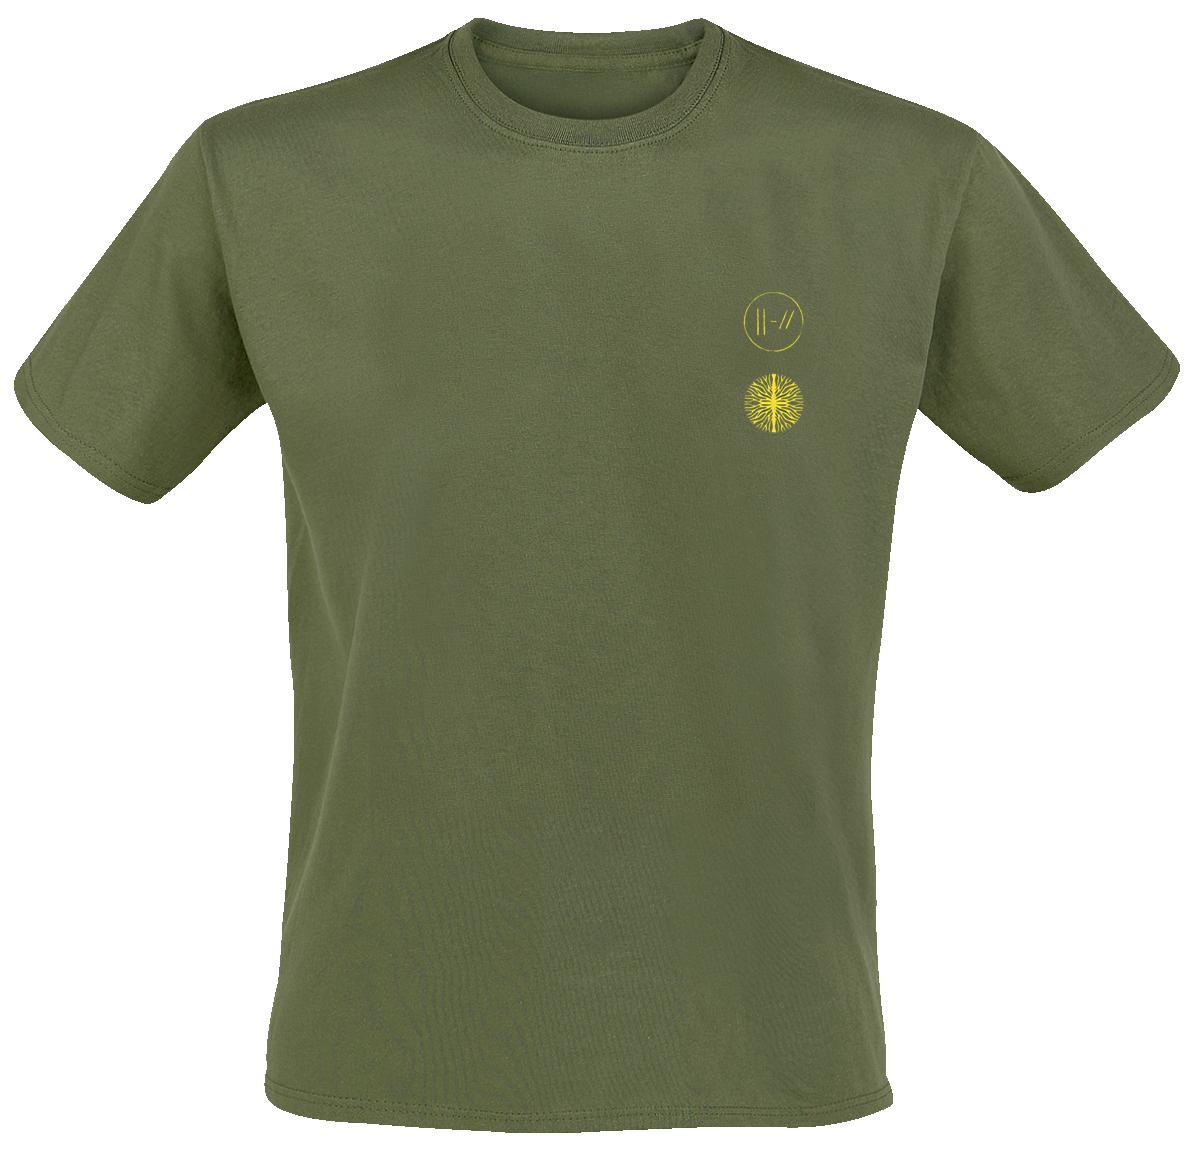 Twenty One Pilots - Cover Me Logo - T-Shirt - green image